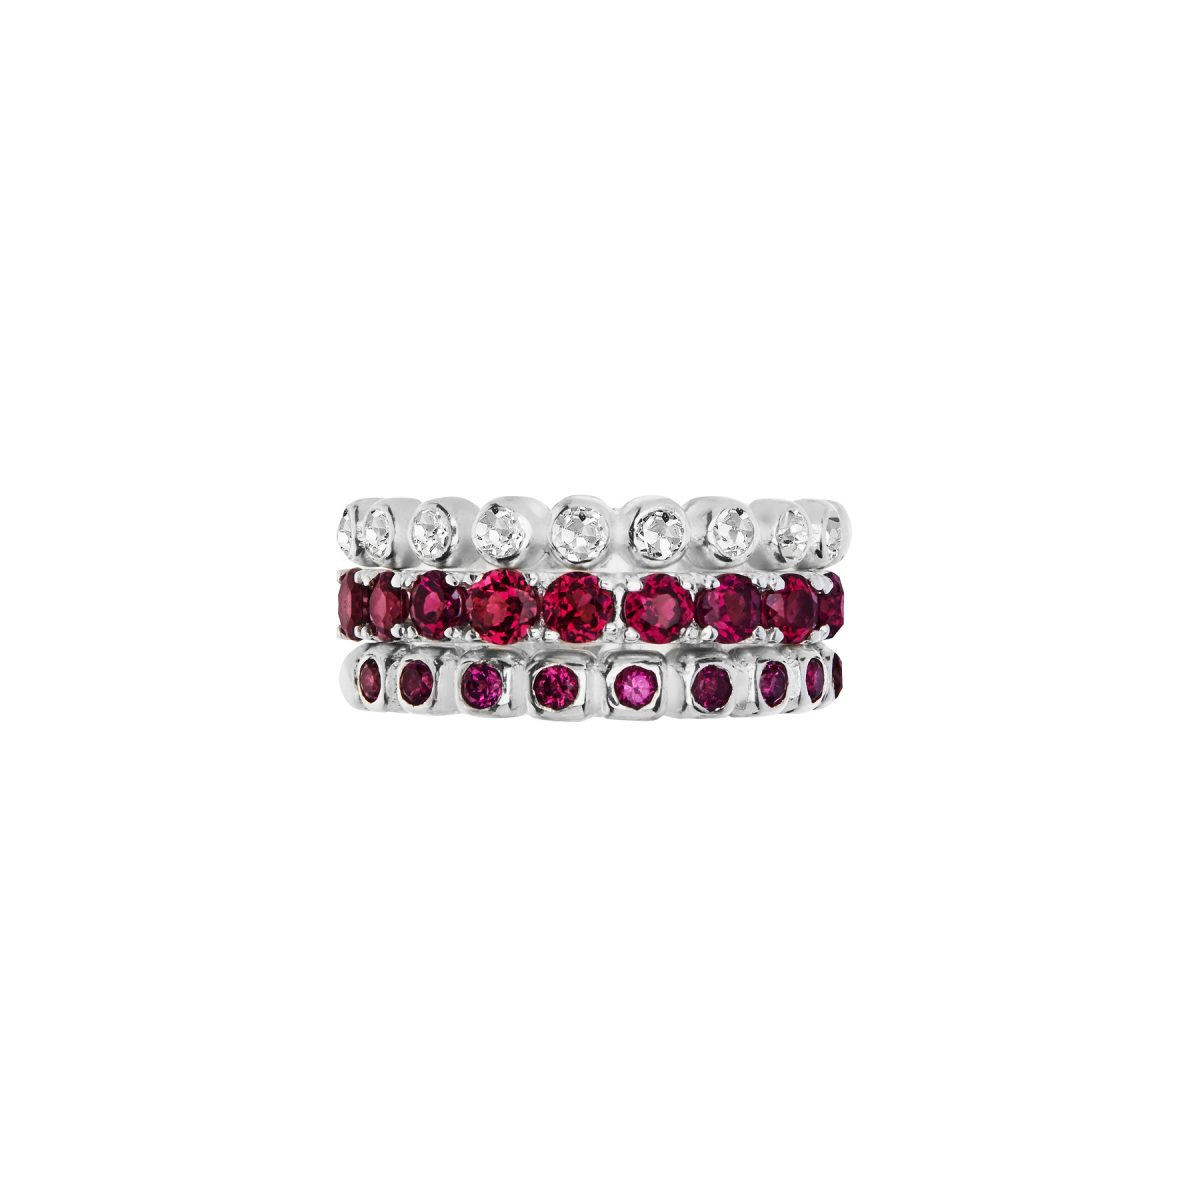 Rhodolite Garnet full eternity ring, bezel set Rhodolite Garnet half eternity ring, bezel set White Topaz half eternity ring.